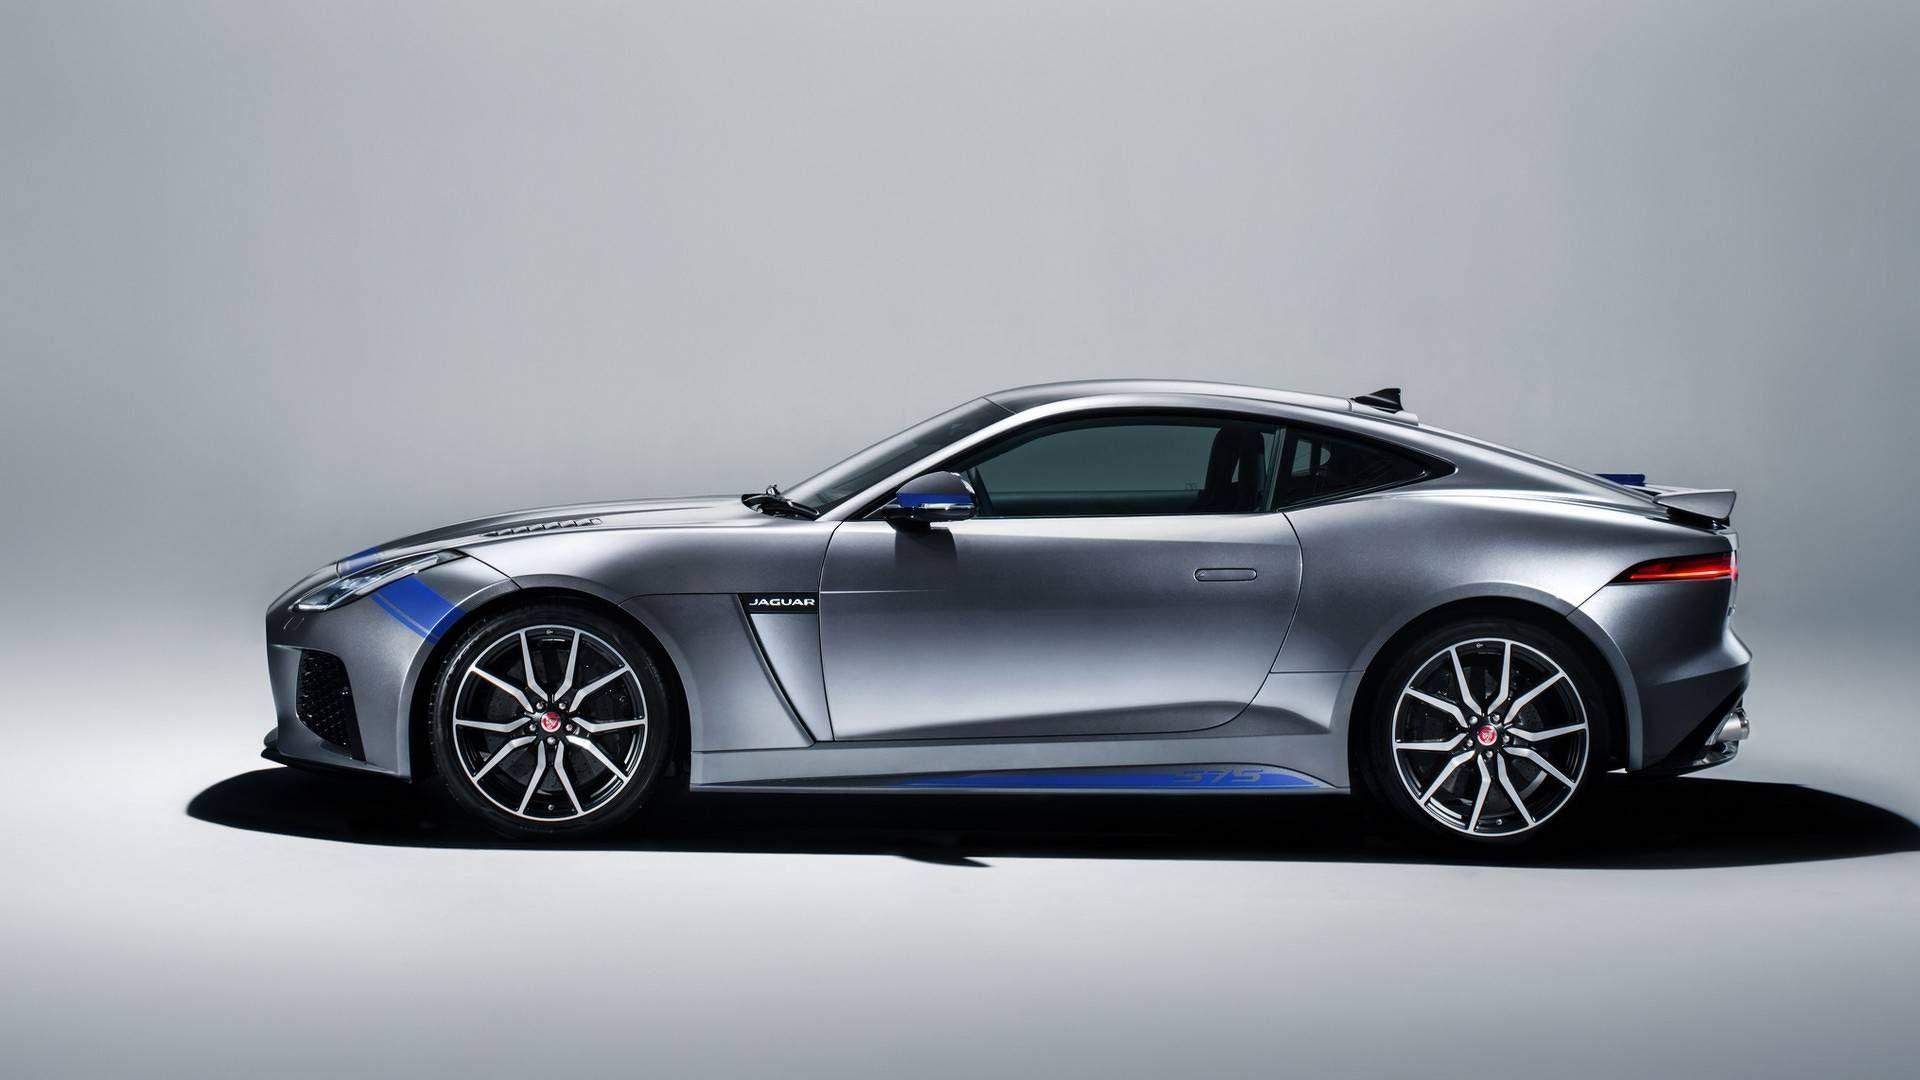 2020 Jaguar F-TYPE - Luxury cars 2020